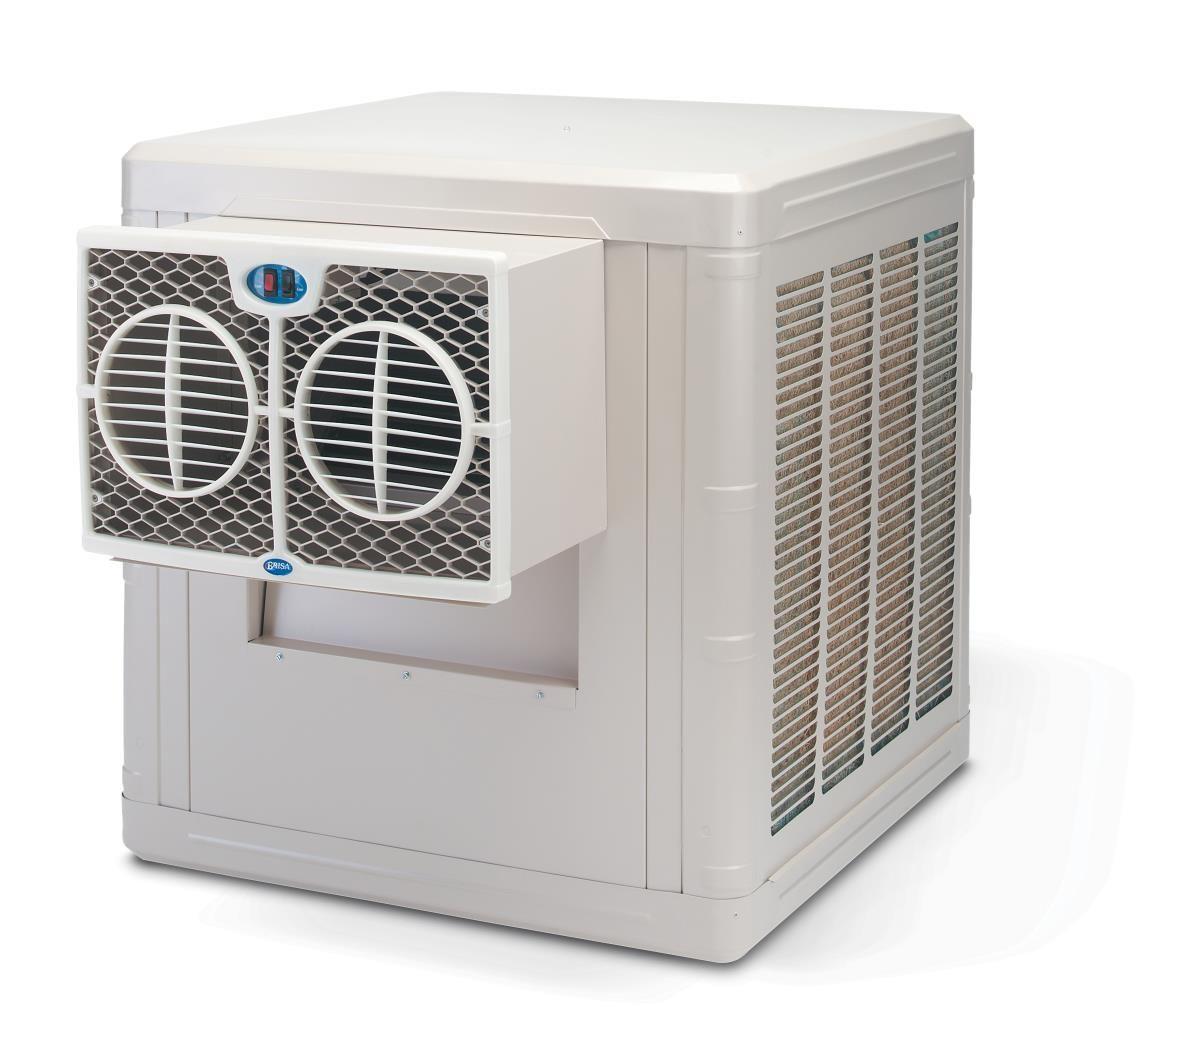 Brisa Bw3004 Window Evaporative Cooler 3000 Cfms Swampcooler Evaporative Cooler Cooling Unit Windows